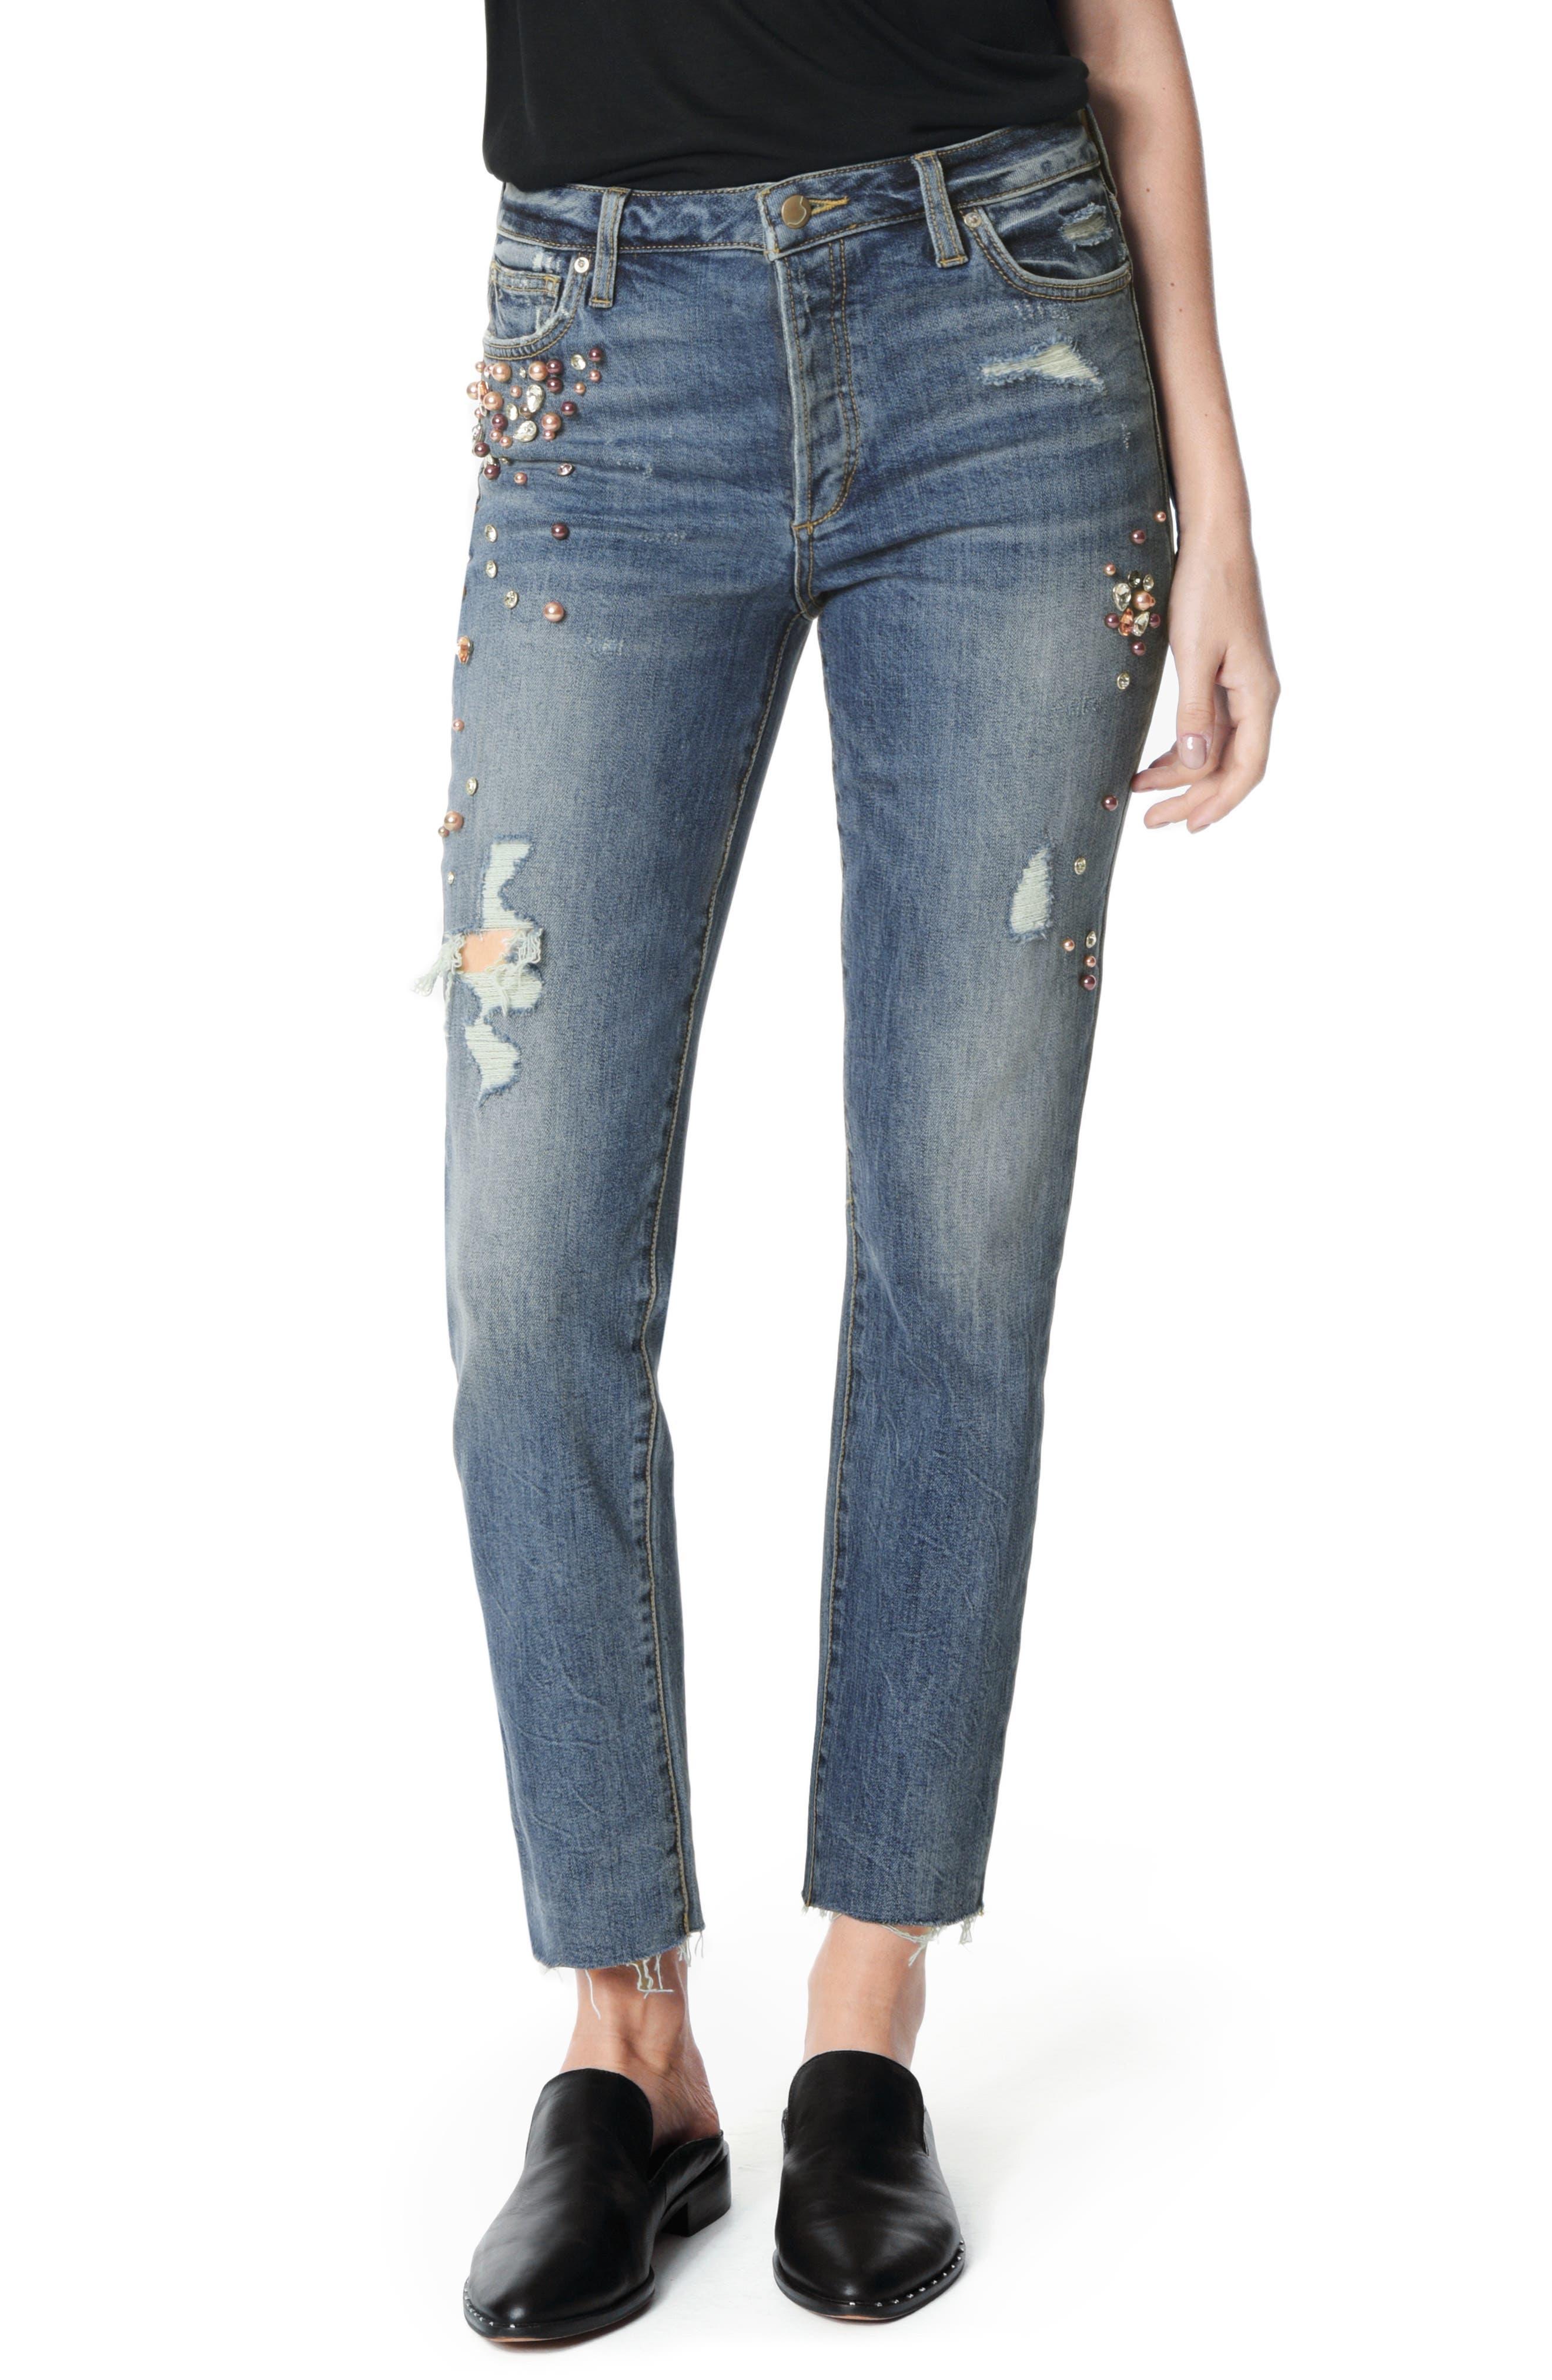 a34045dbf08317 Cheap women's boyfriend jeans for sale - Discount store - Cools.com